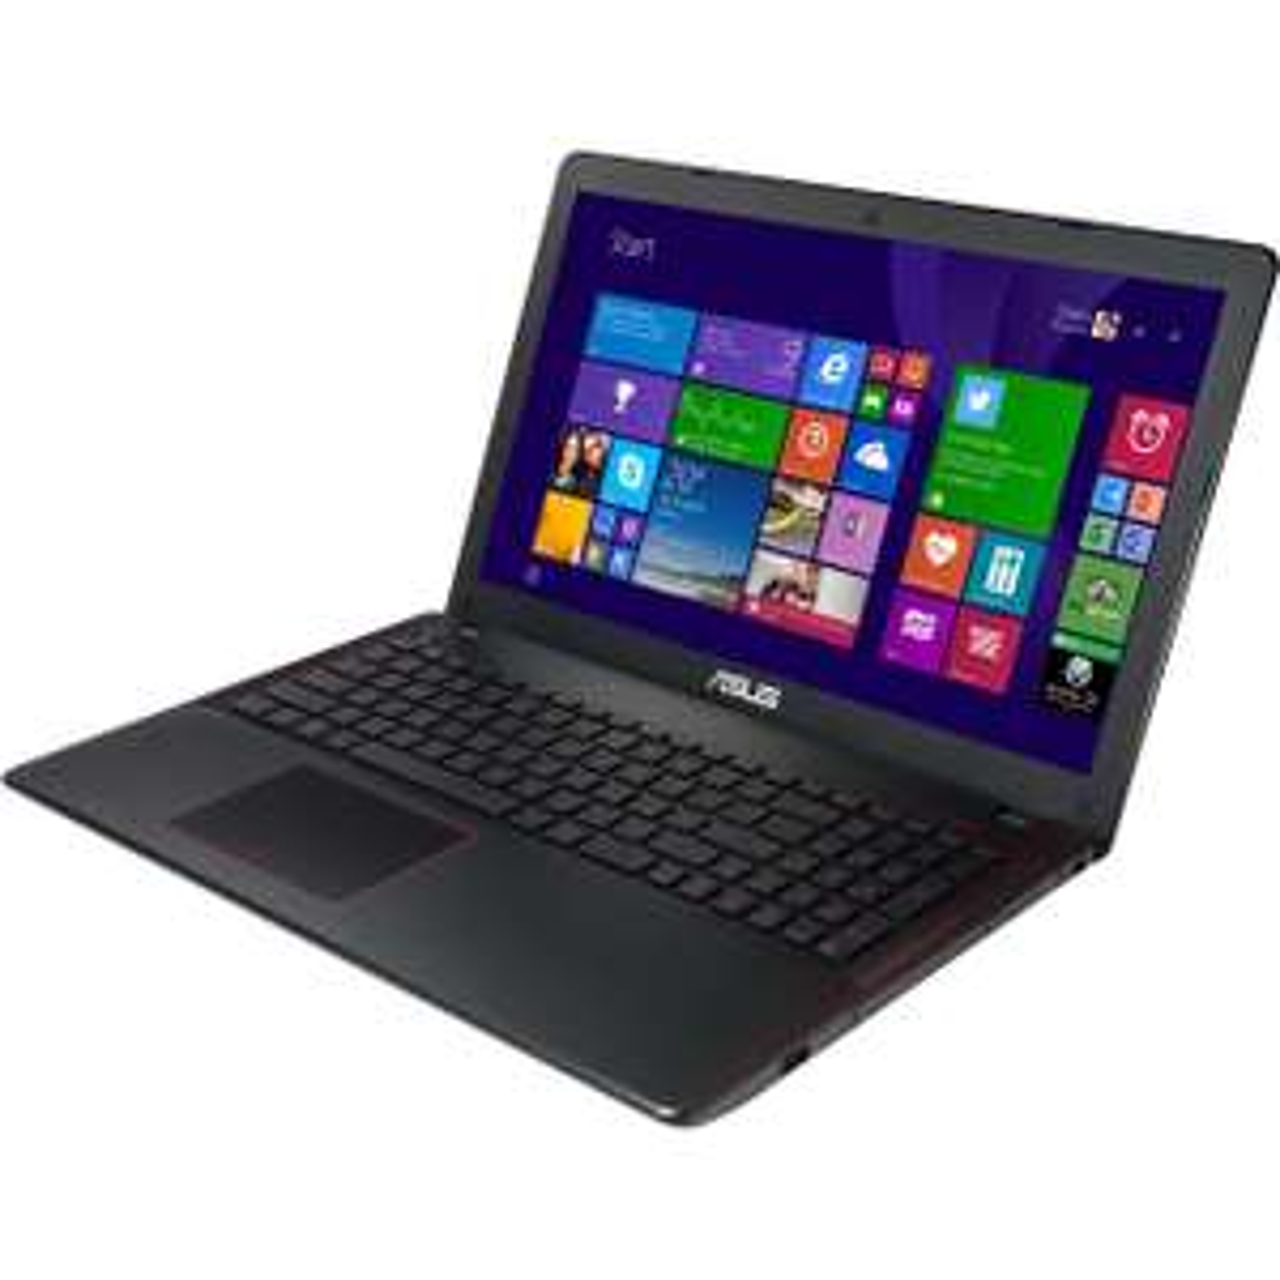 "Asus X550VX 15.6"" Gaming Laptop - Core i5, 8GB RAM, 1TB HDD, 128GB SSD £649 + £75 Cashback + £10 off Code @ AO.com"